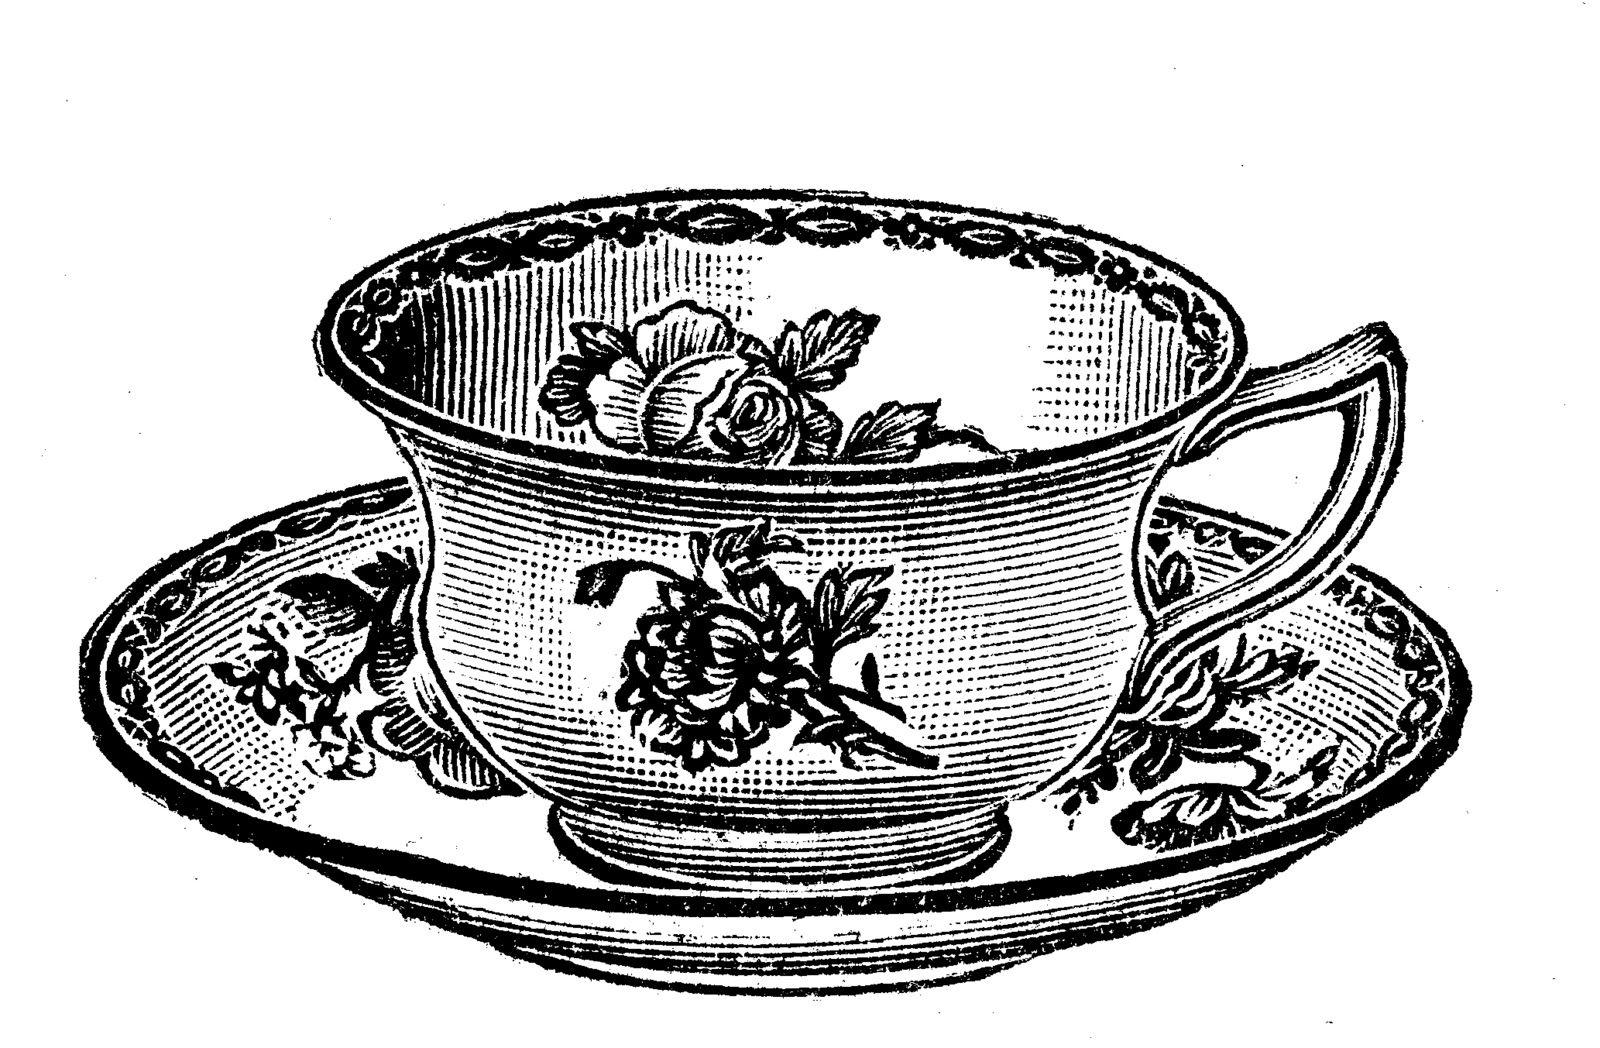 Free vintage clip art images: Vintage tea party crockery.